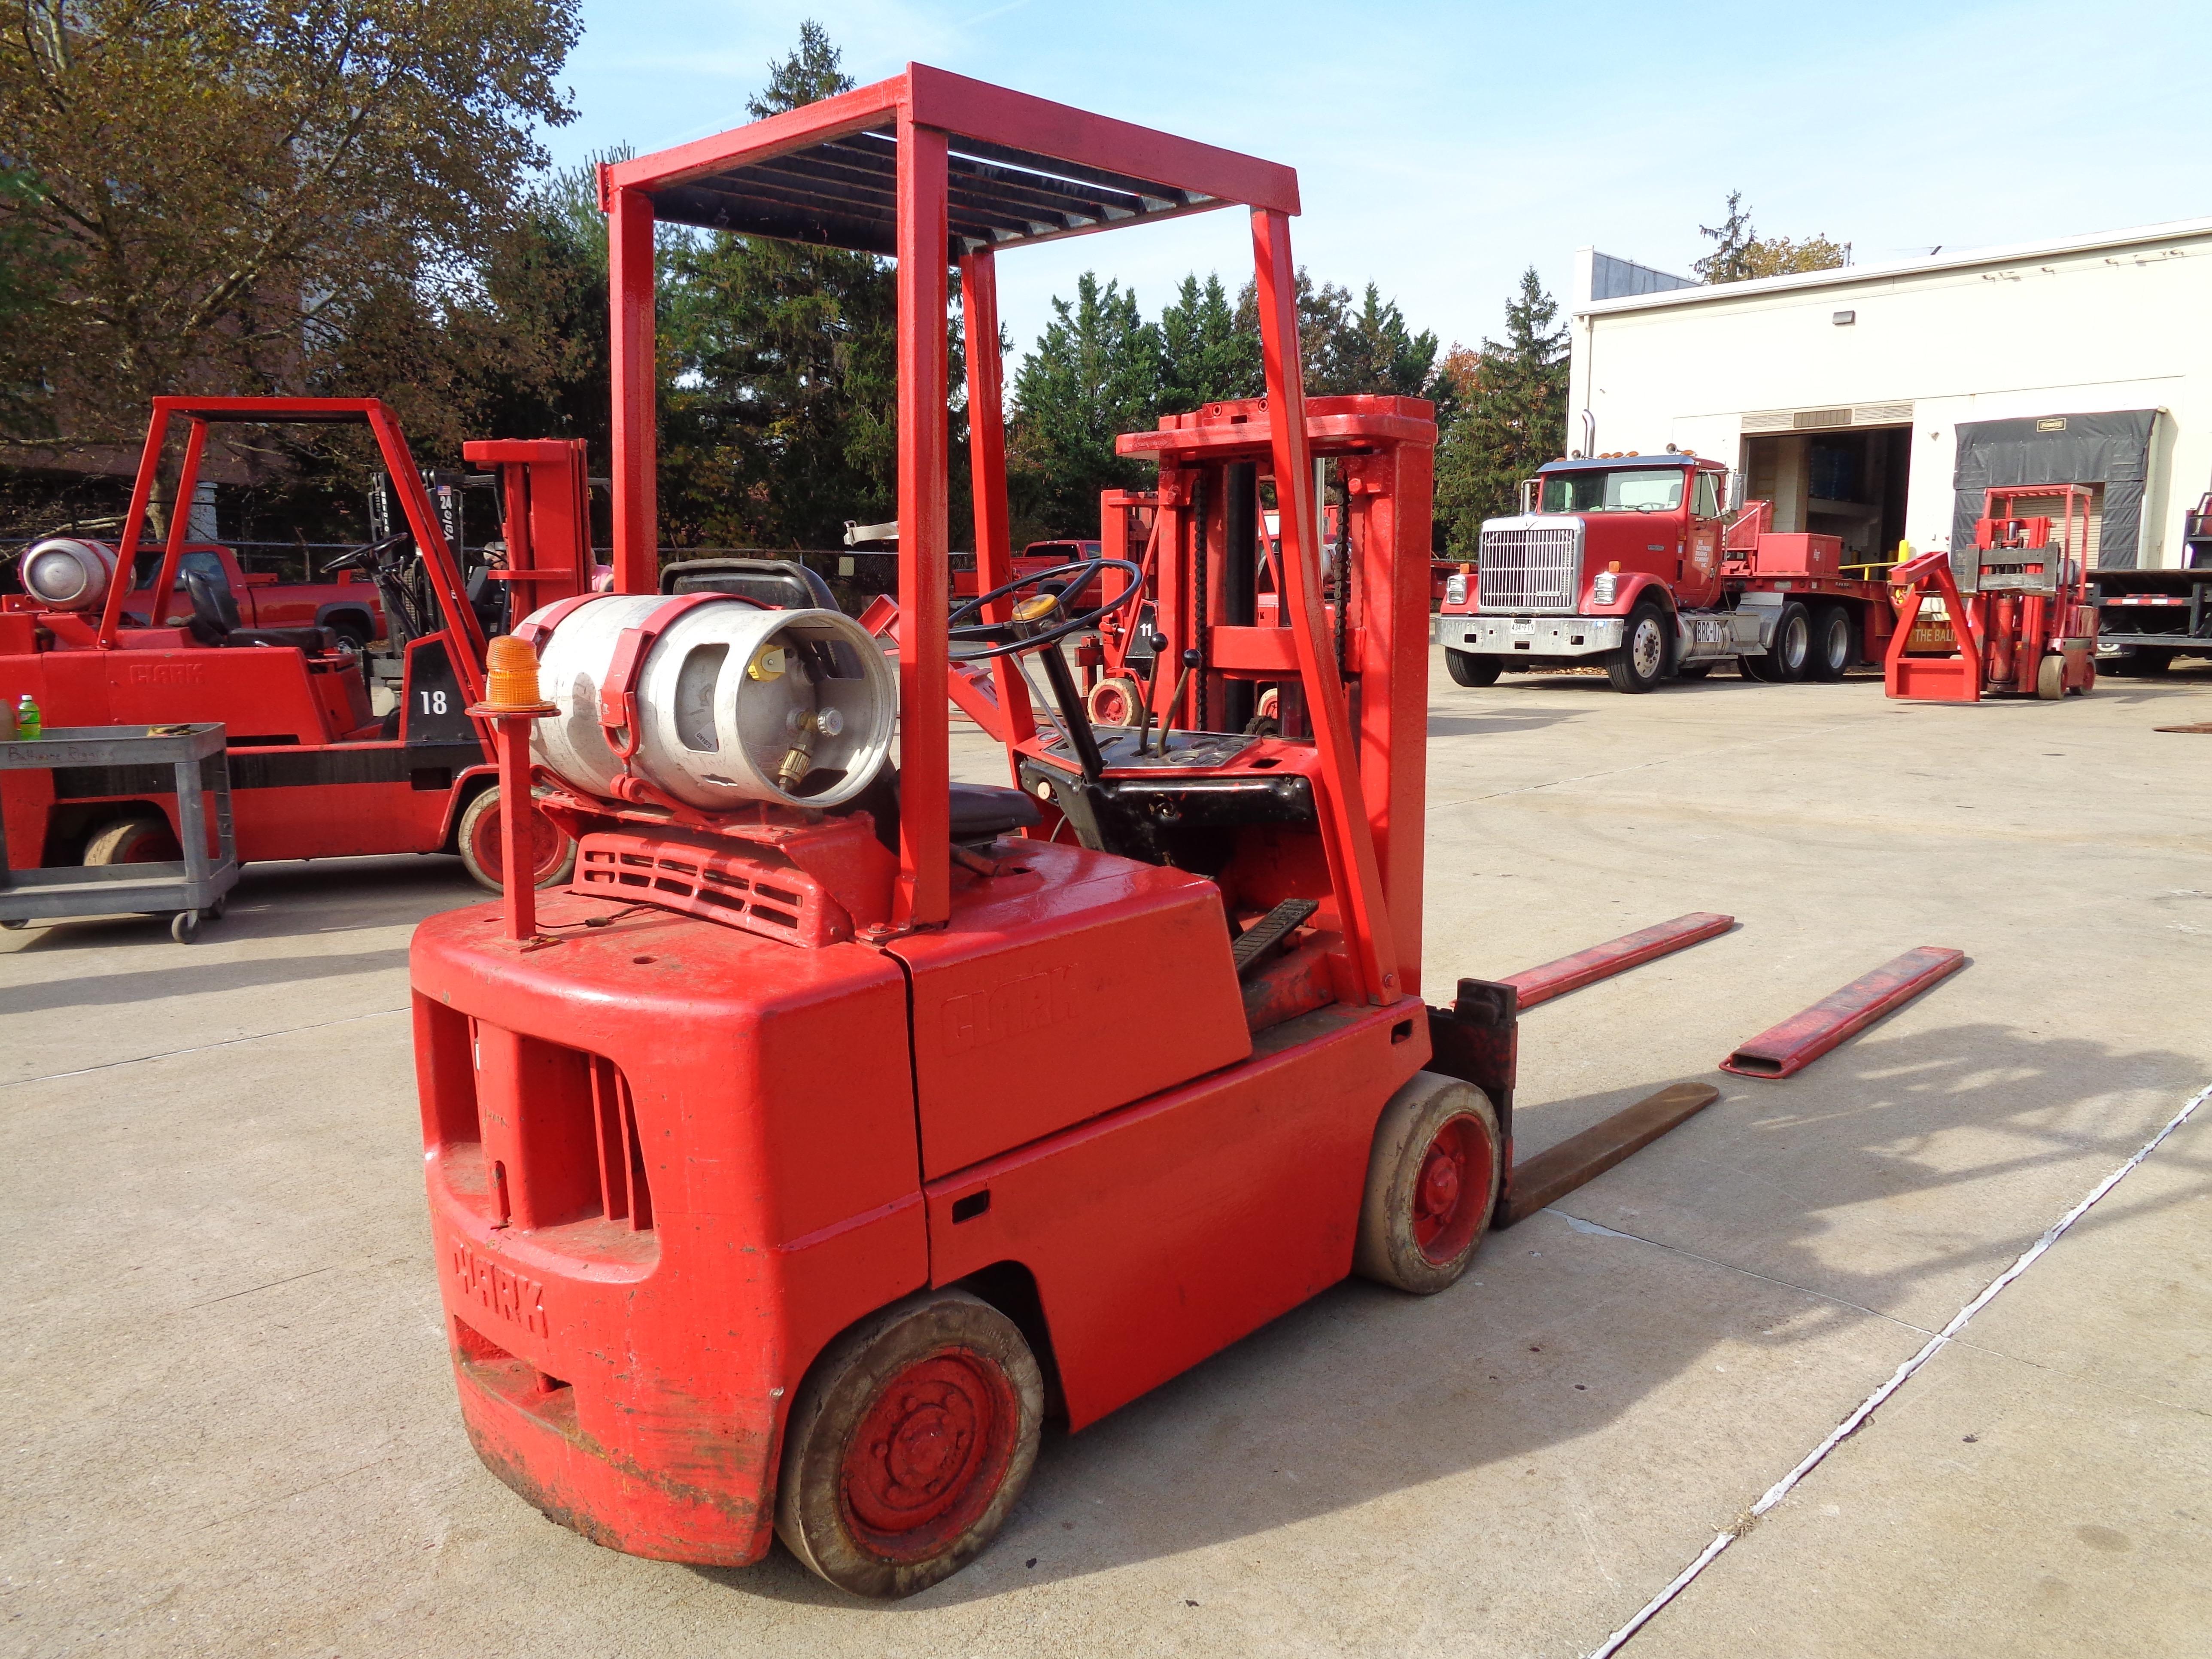 Clark C500-45 Forklift- 4,500 lbs - Image 7 of 10